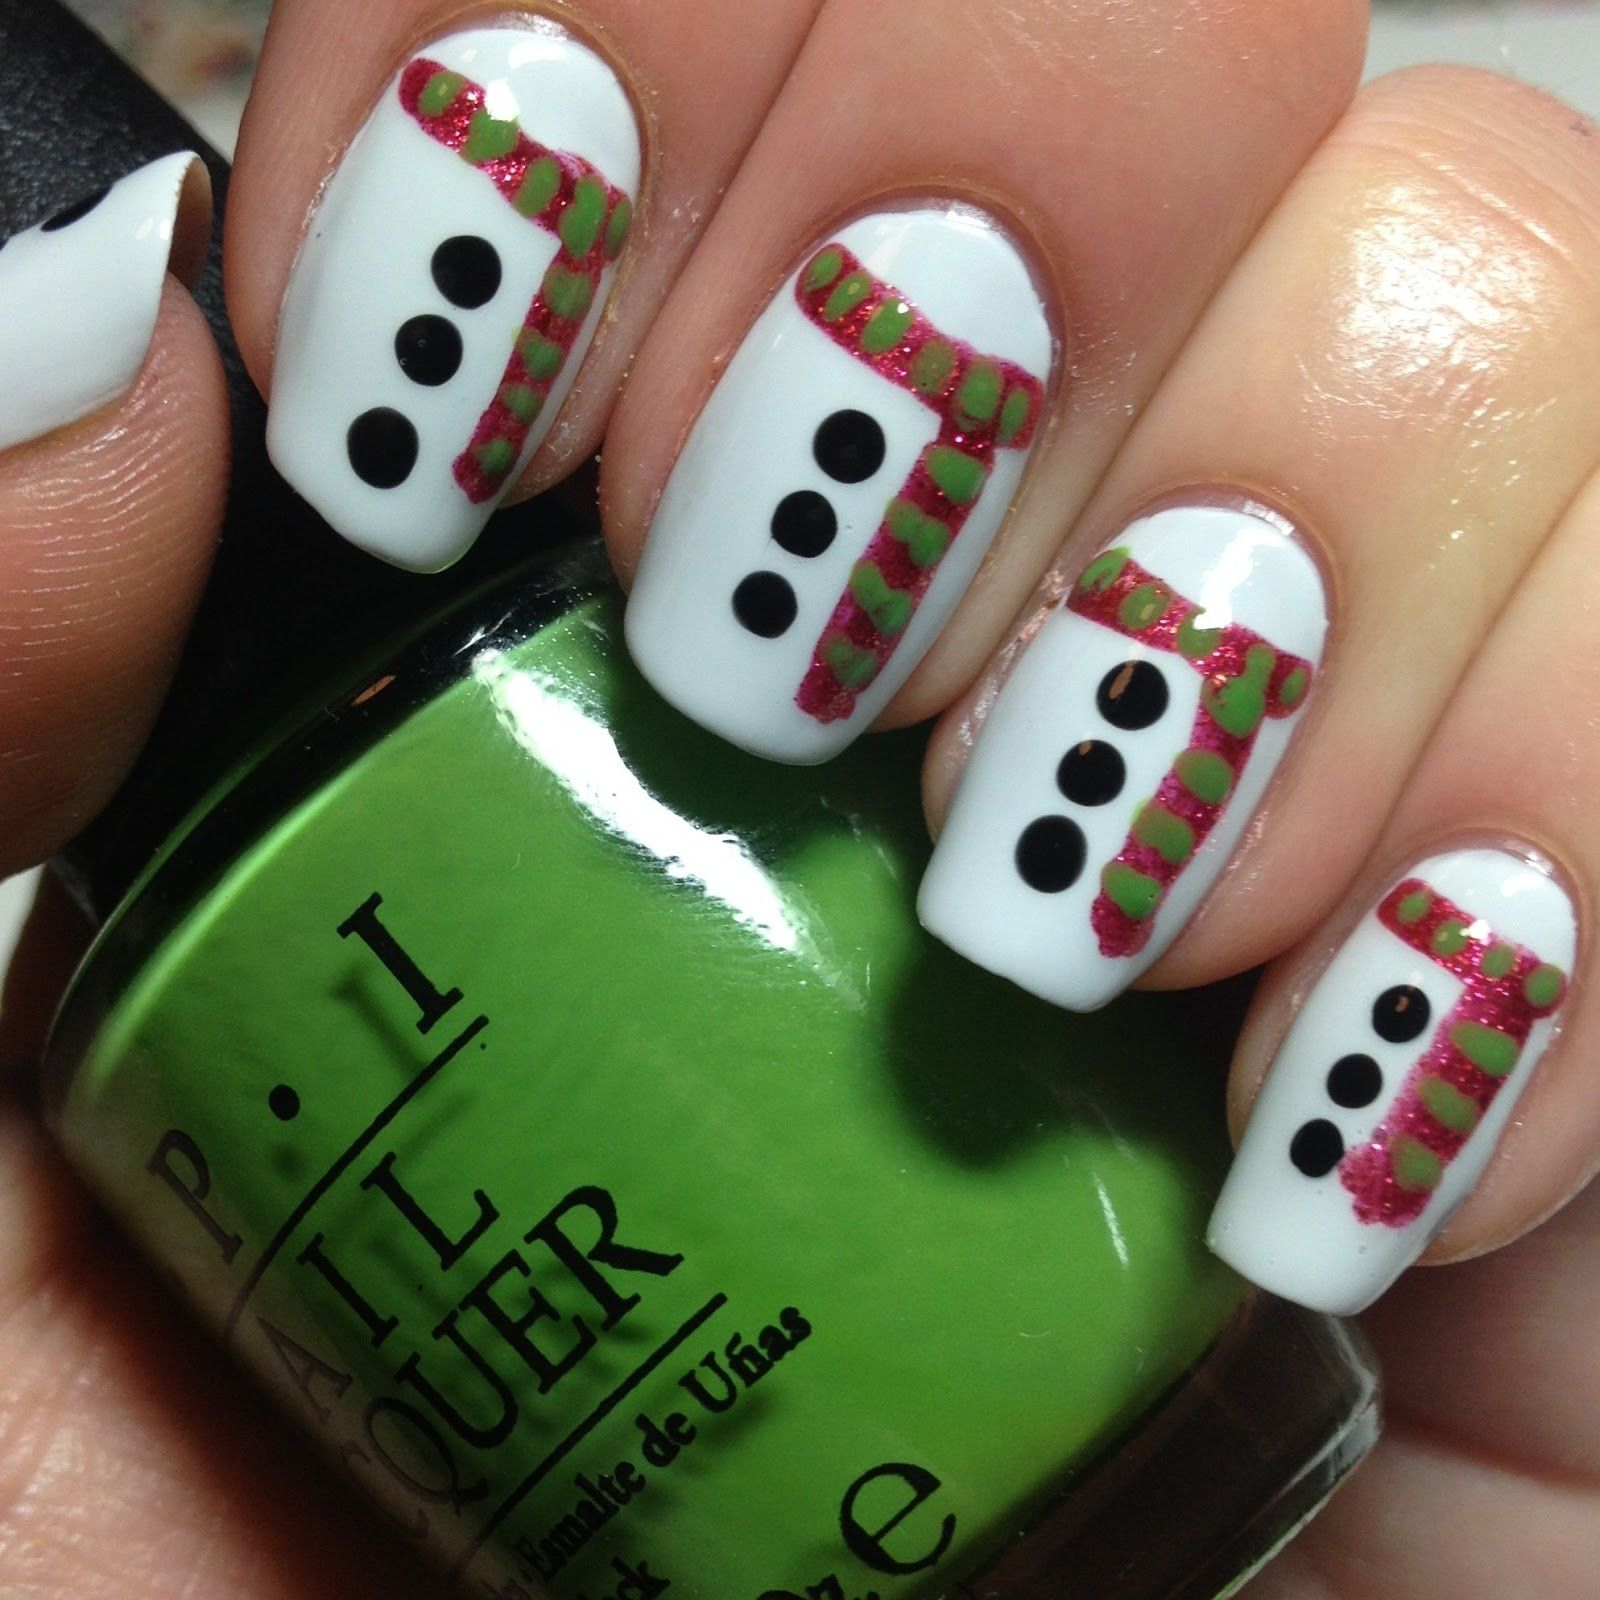 Uñas con espíritu navideño: Hombre de Nieve! | Nails | Pinterest ...